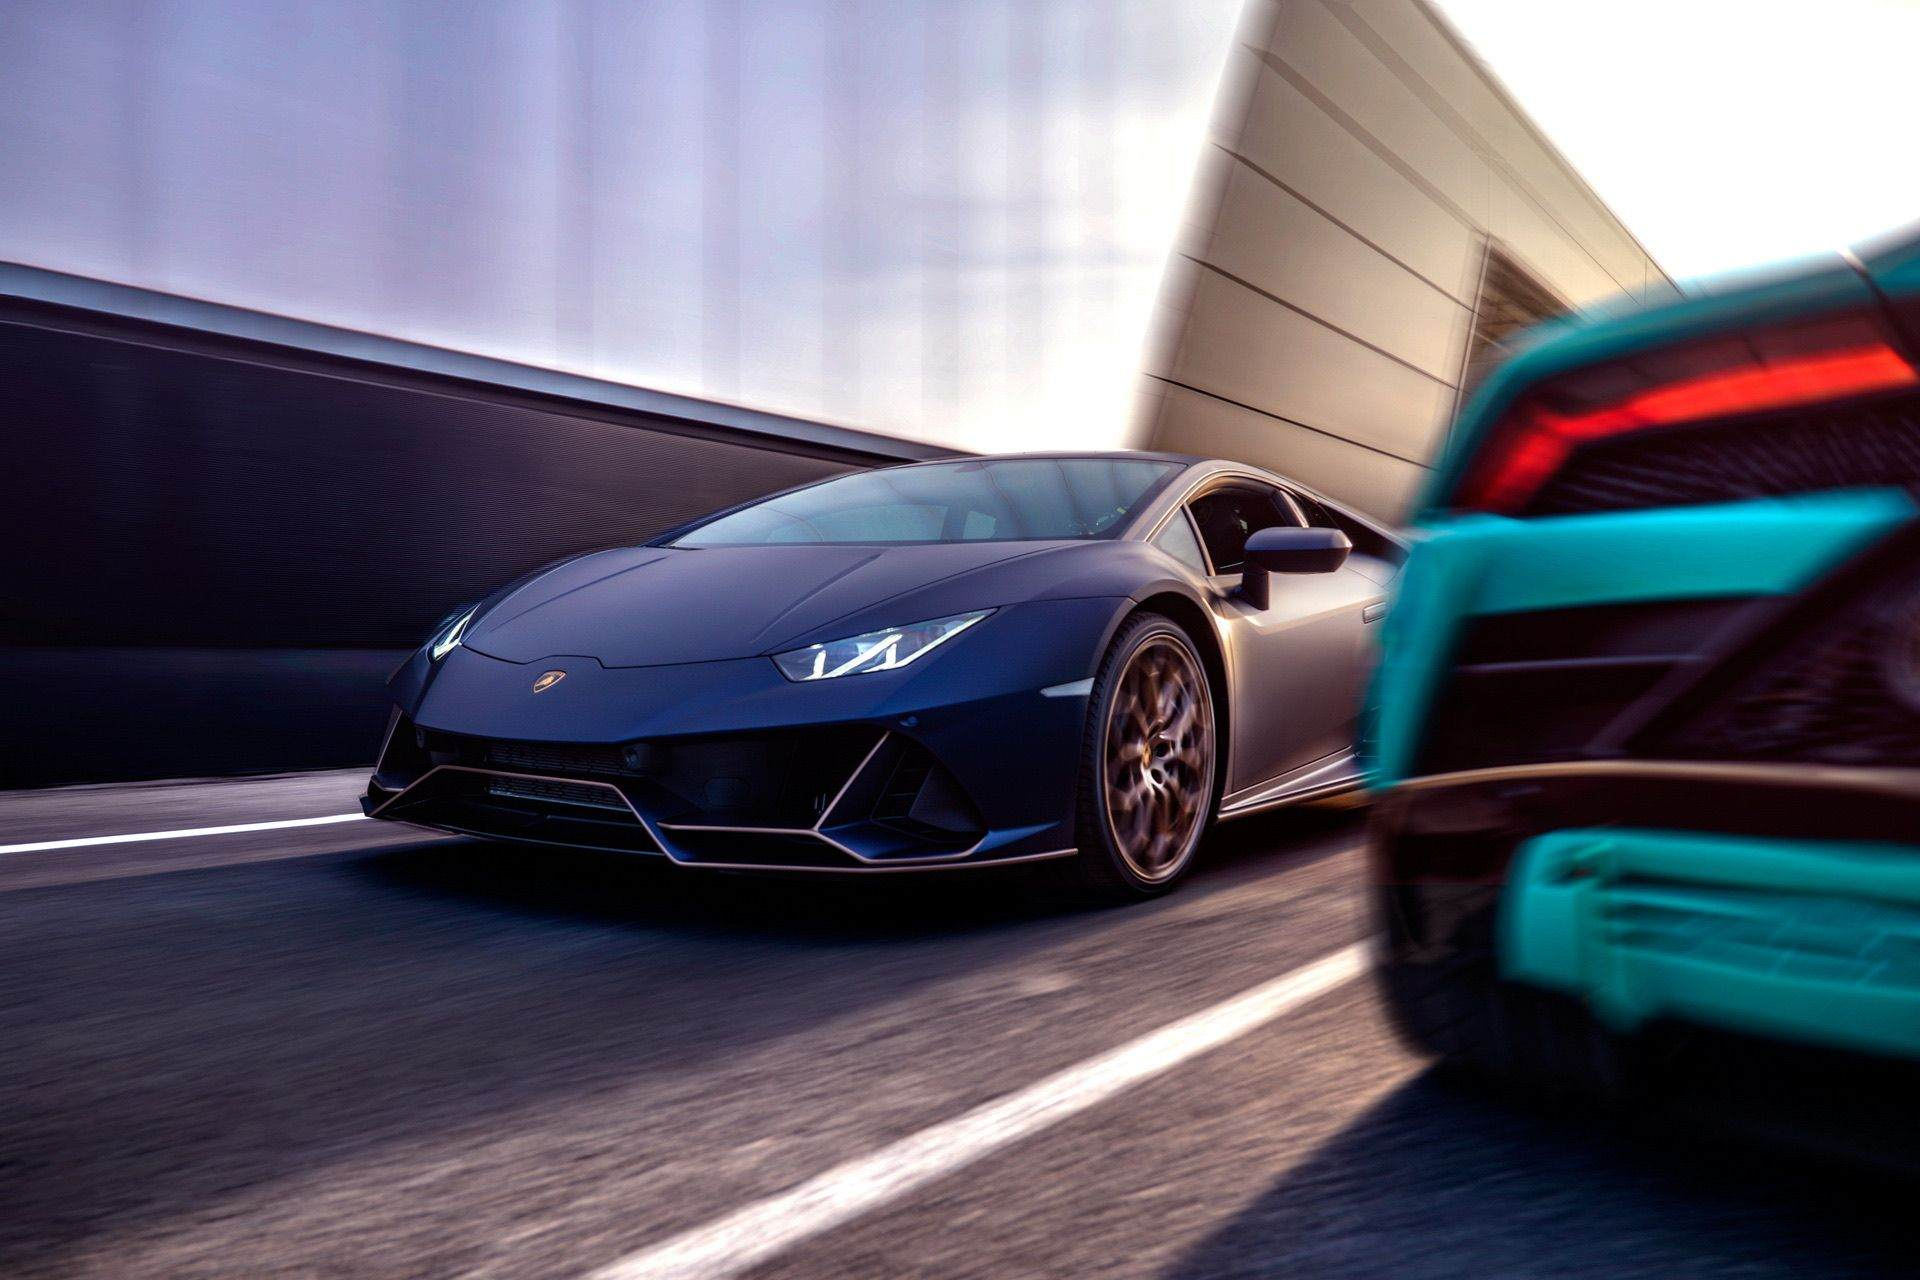 Lamborghini-Huracan-for-Mexico2_1920x1280